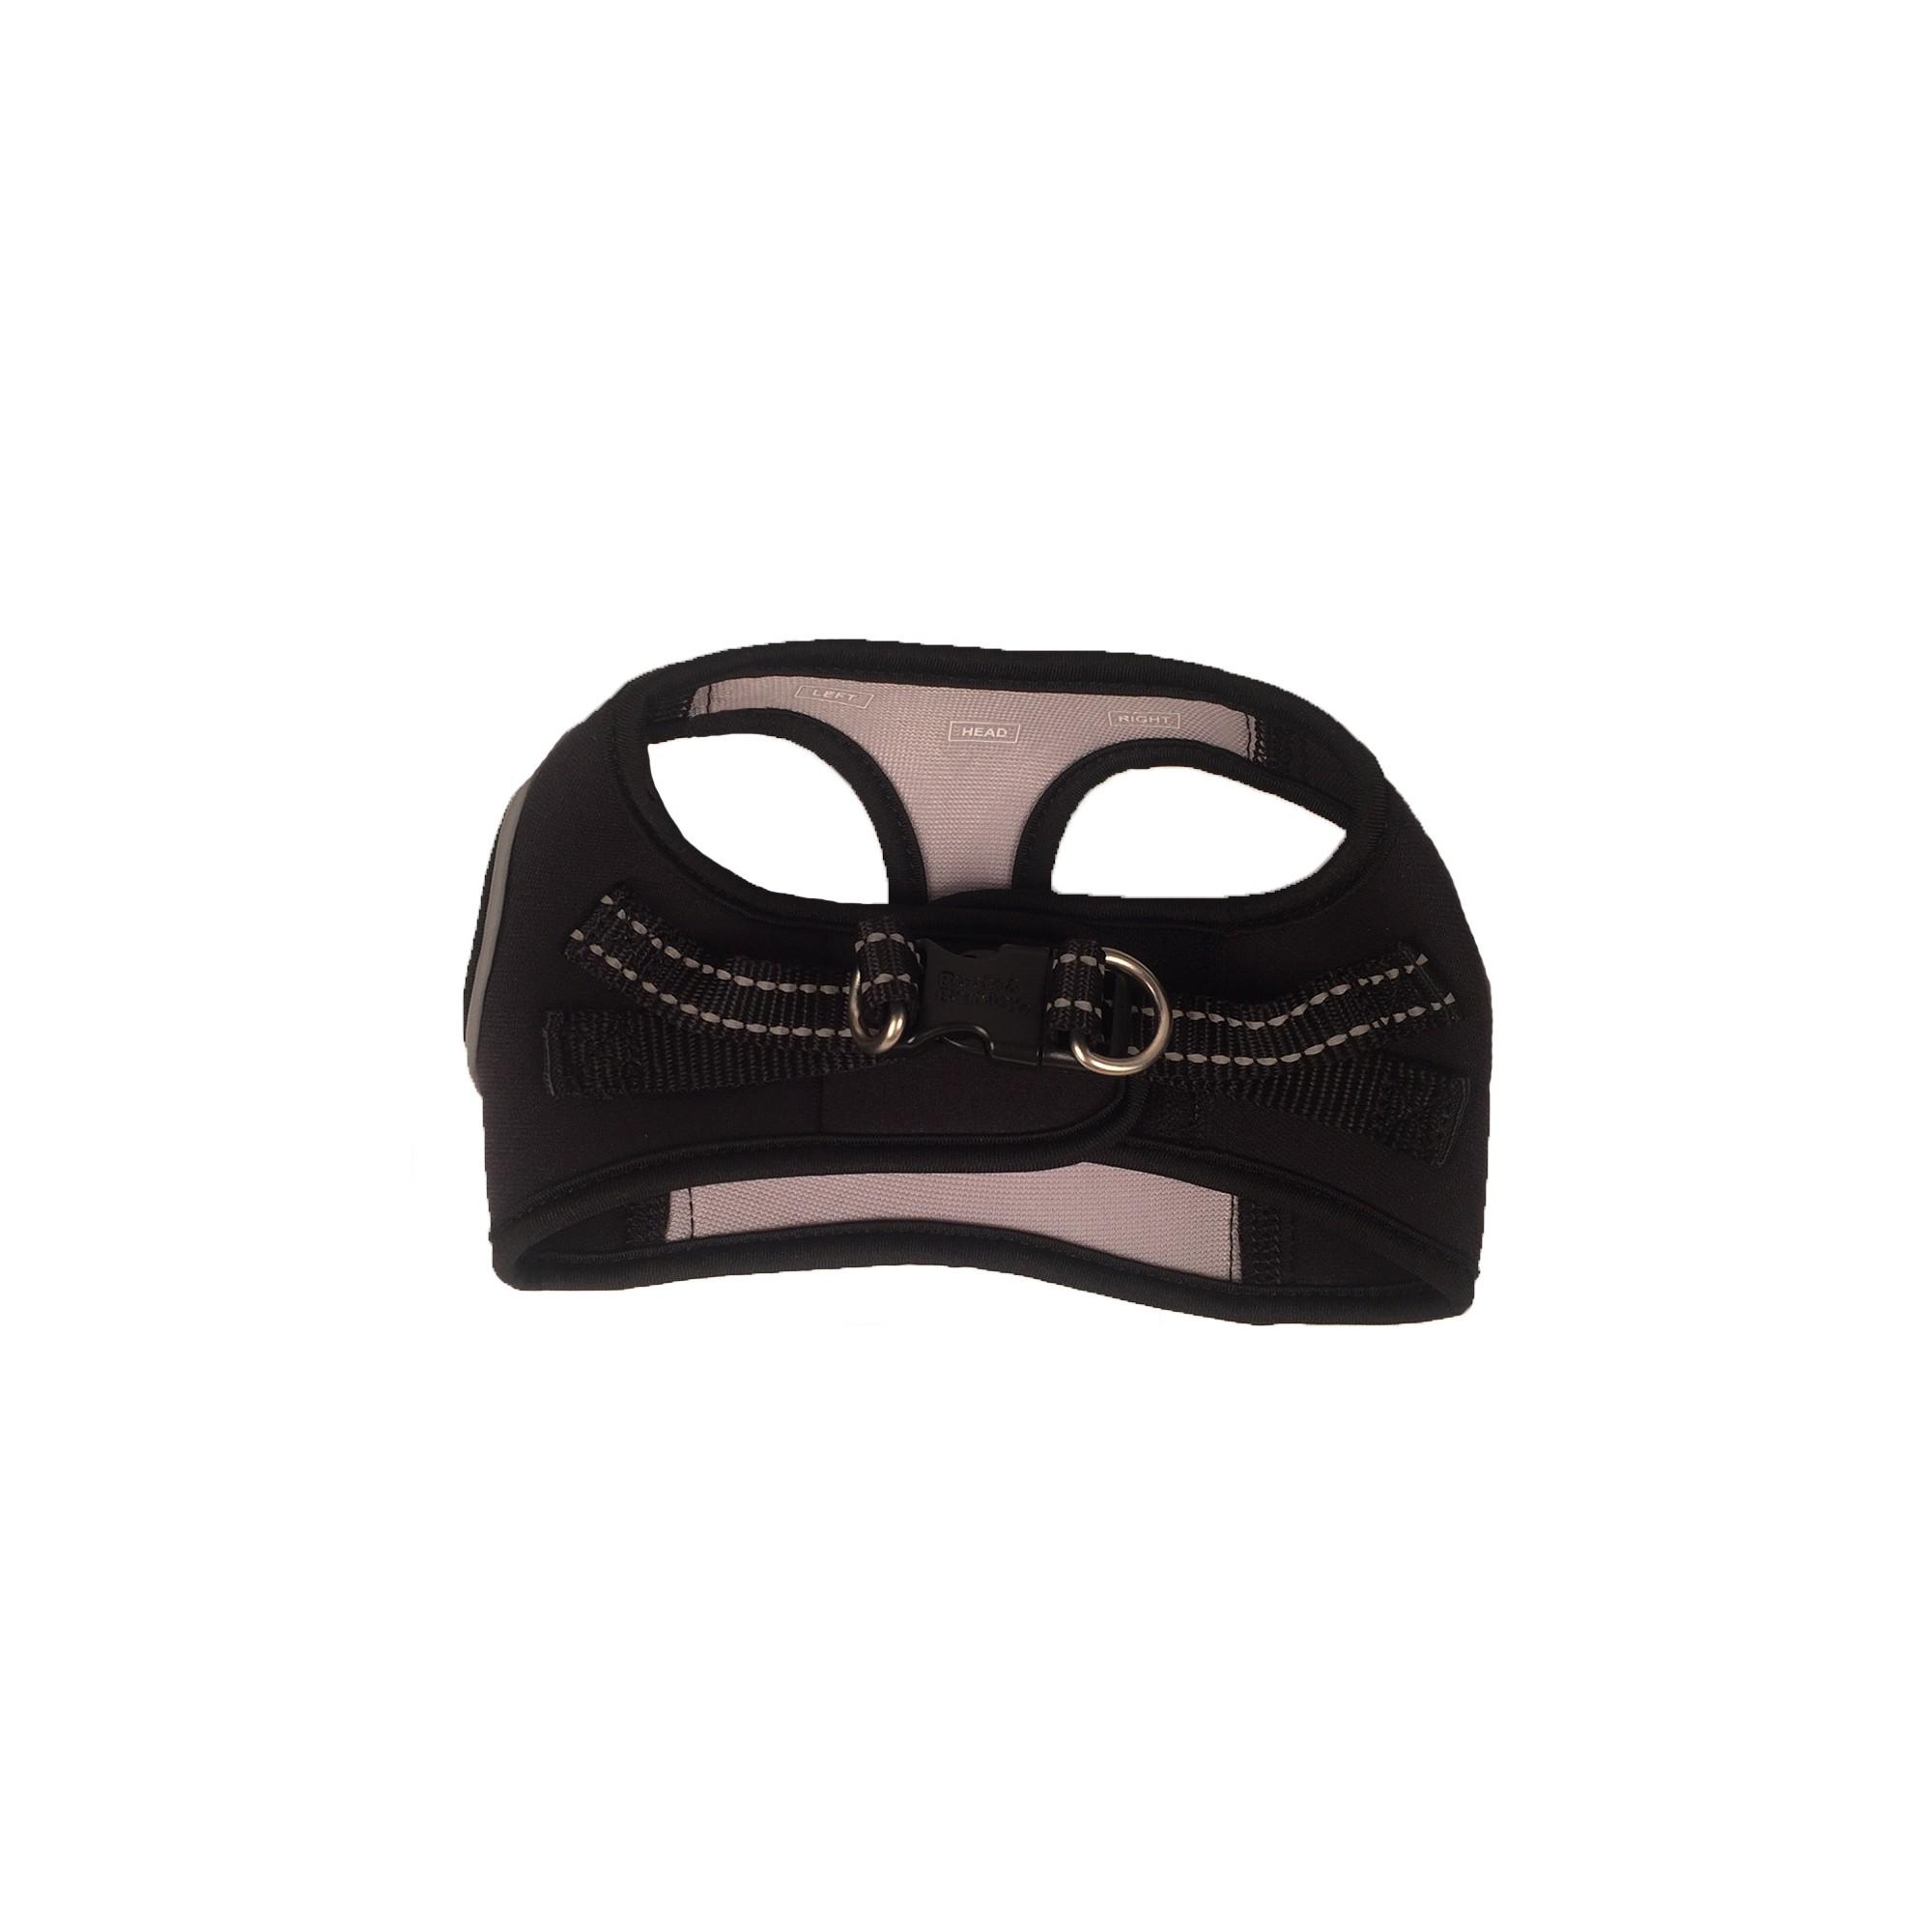 Ultimate Comfort Dog Harness - Black/Grey - XS - Boots & Barkley, Black Gray